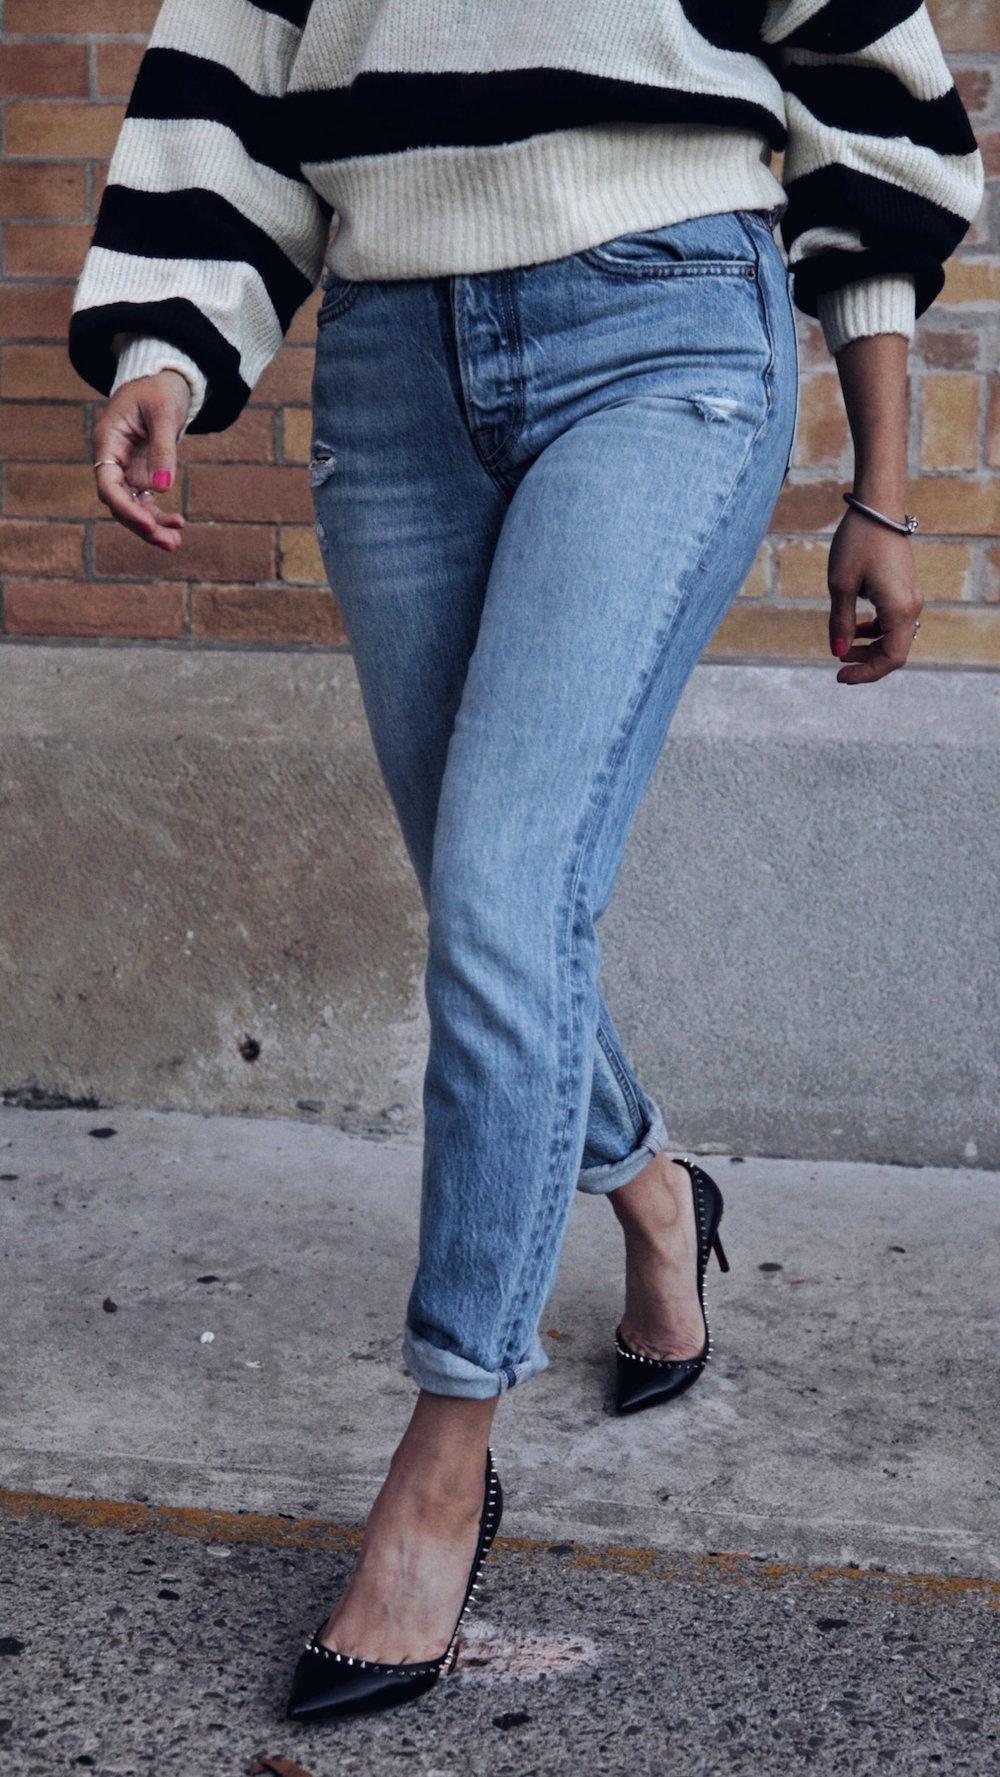 follow me on IG @_nathaliemartin - REVOLVE striped sweater, GRLFRND Karoline jeans, Christian Louboutin Anjalina shoes - woahstyle.com 8.JPG